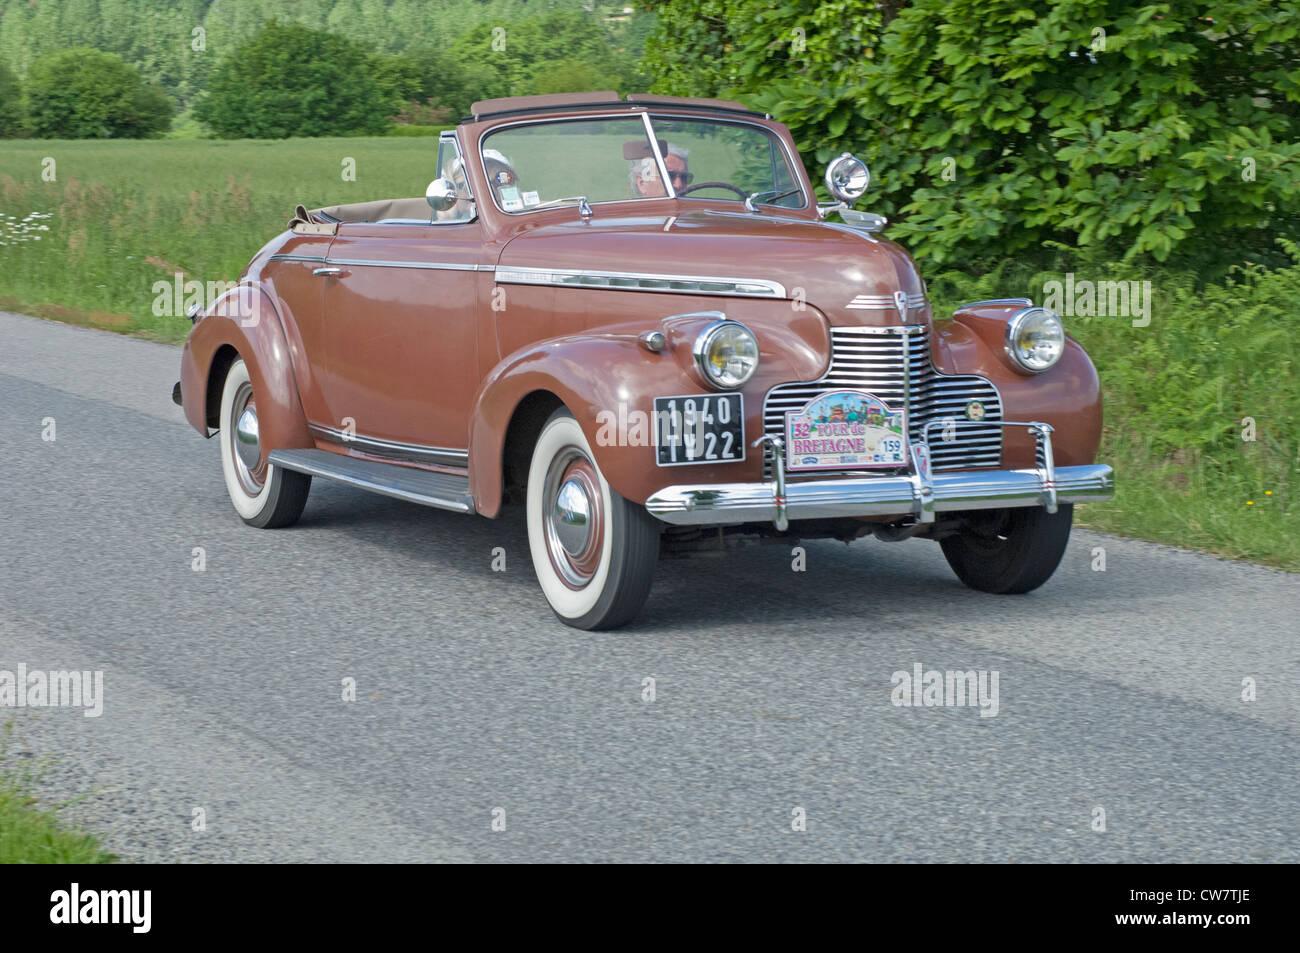 Chevrolet Cabriolet de Luxe of 1940 in the Tour de Bretagne 2012 - Stock Image